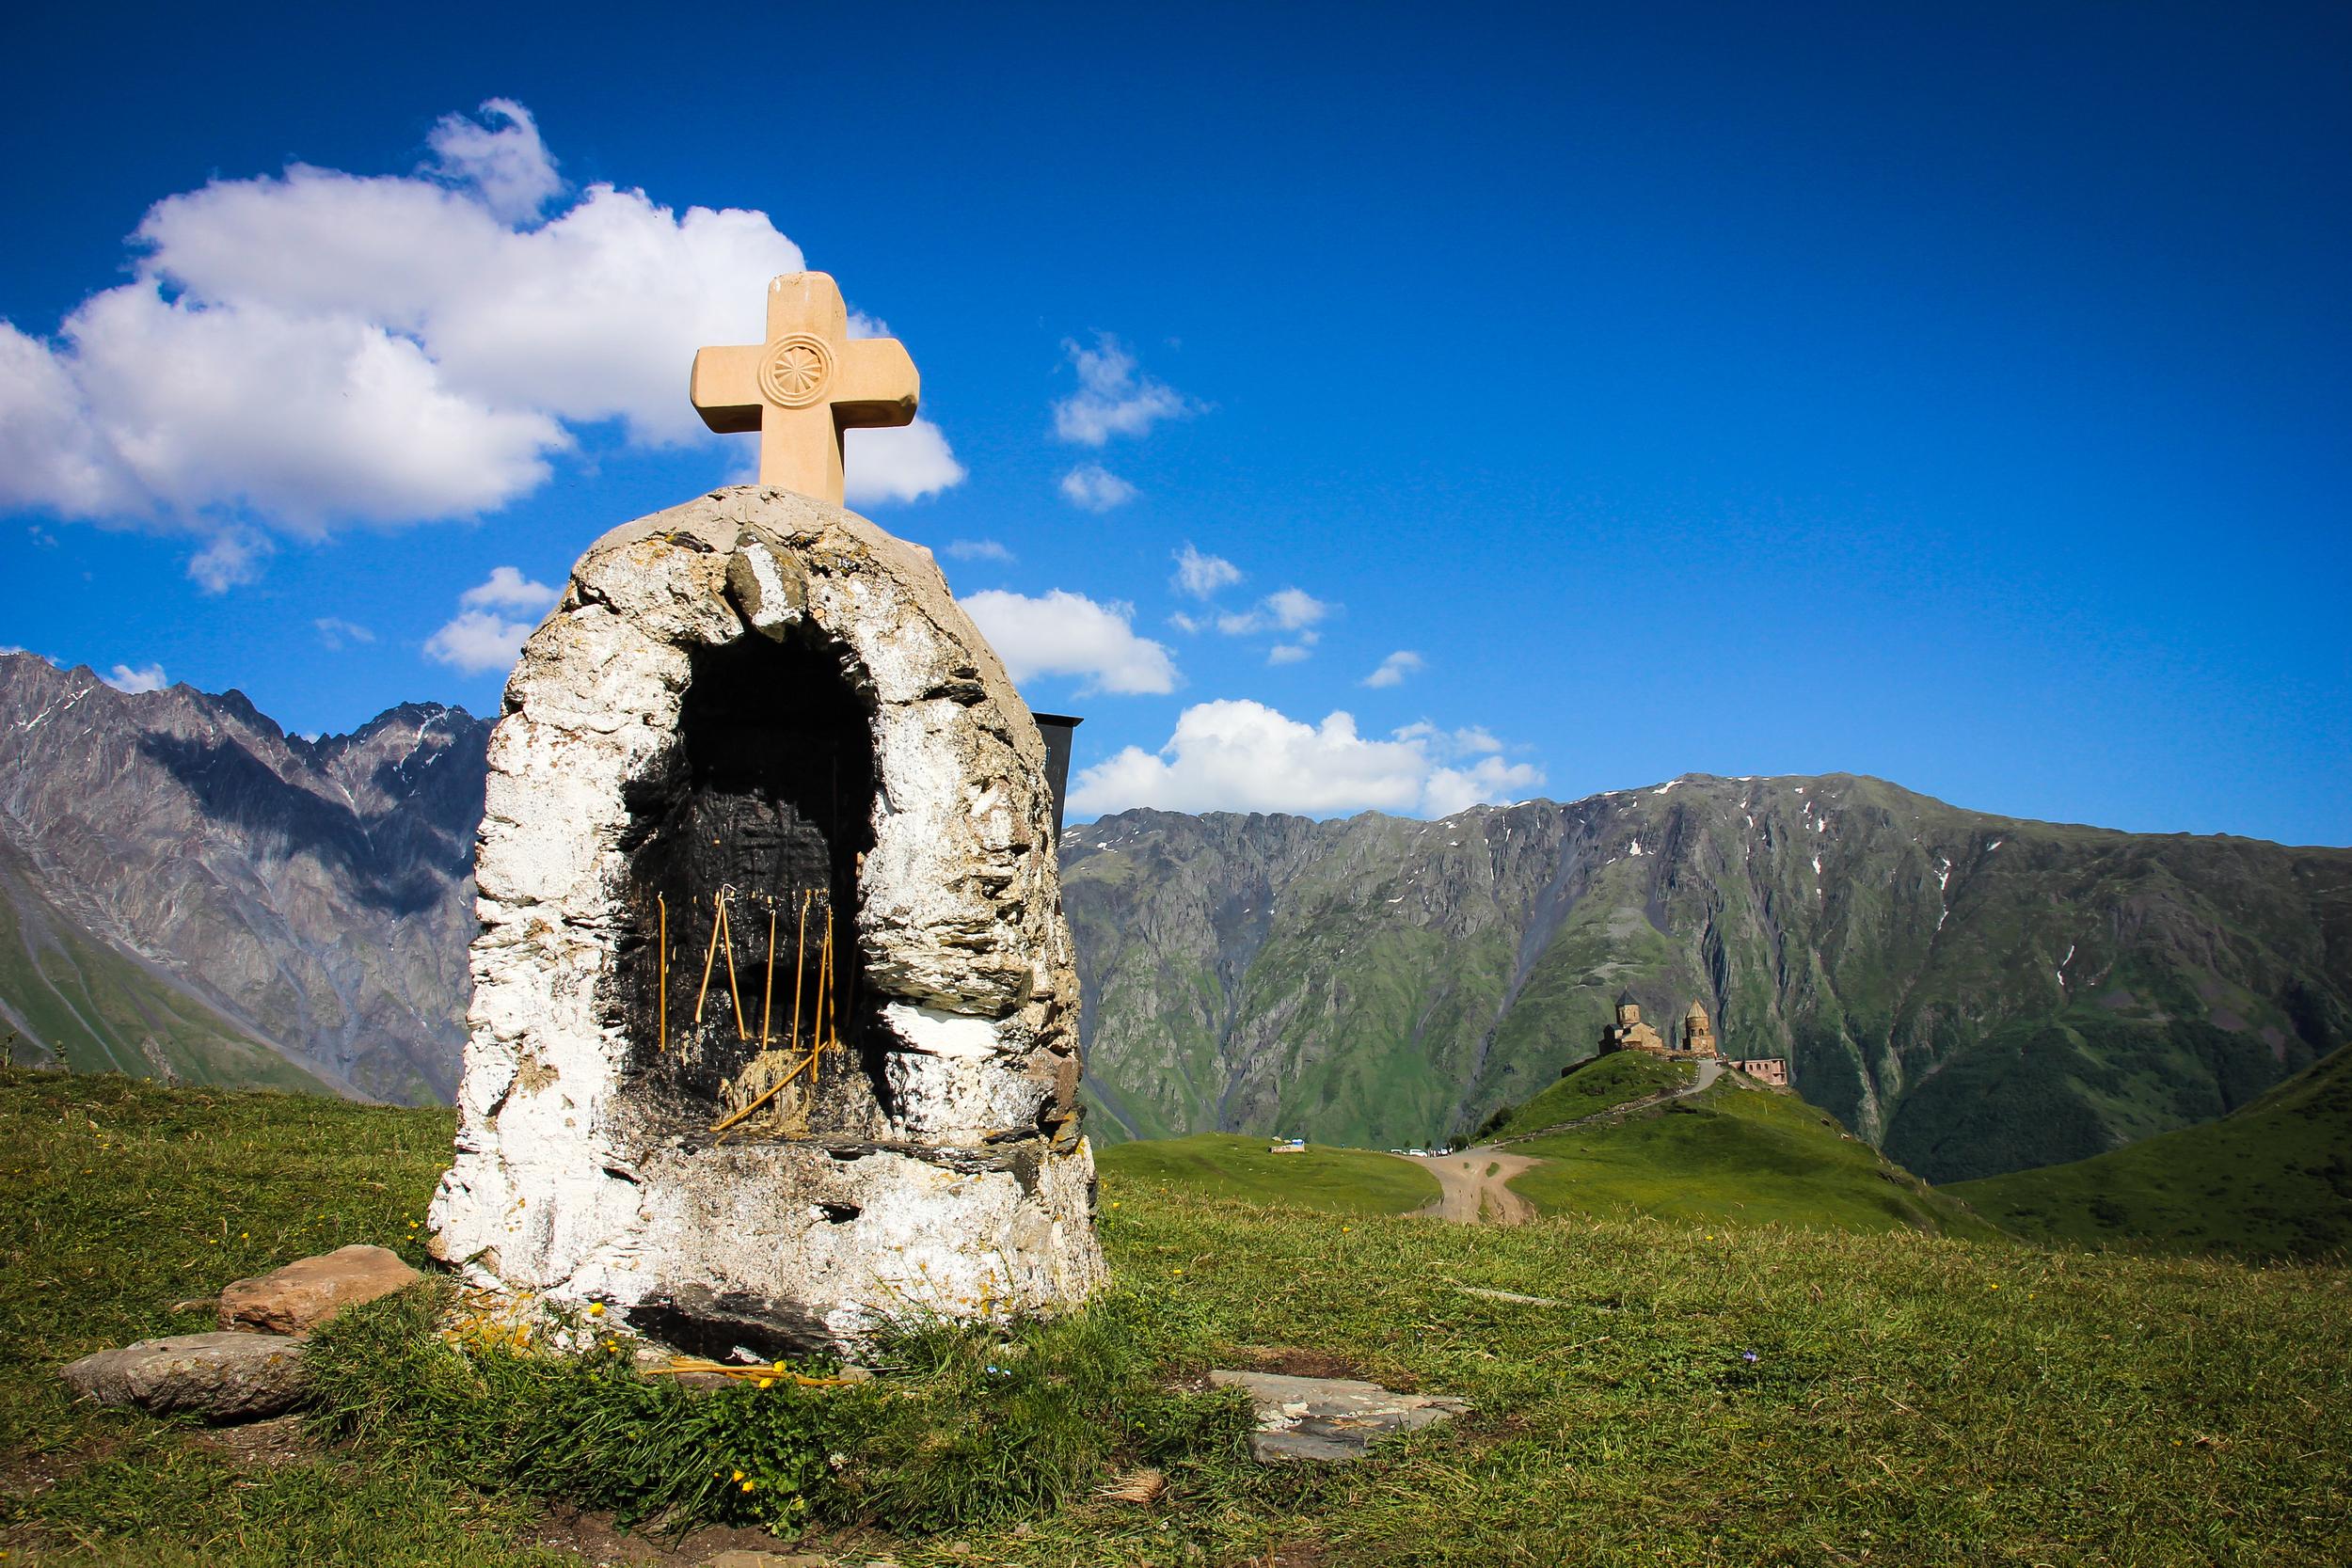 Kazbegi . Gergeti Trinity Church in the far. Trekking to the church takes around 3-4 hours.